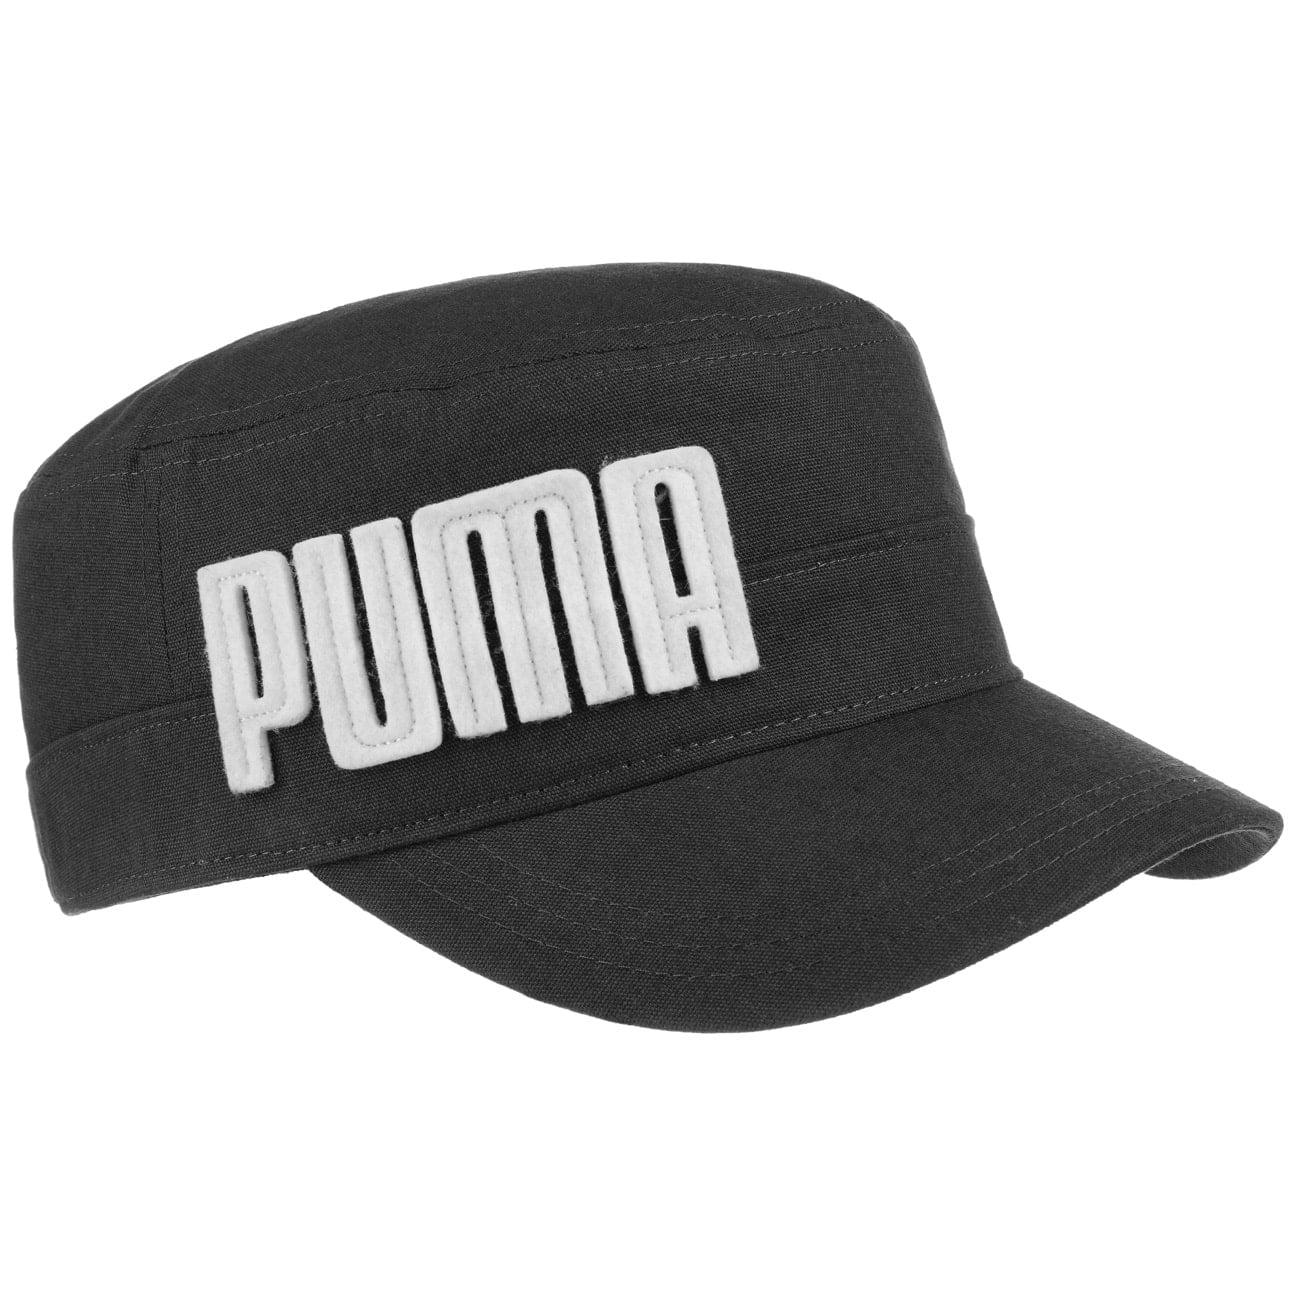 c56564cacc7ba Gorra Penham Military Army Cap by PUMA - Gorras - sombreroshop.es